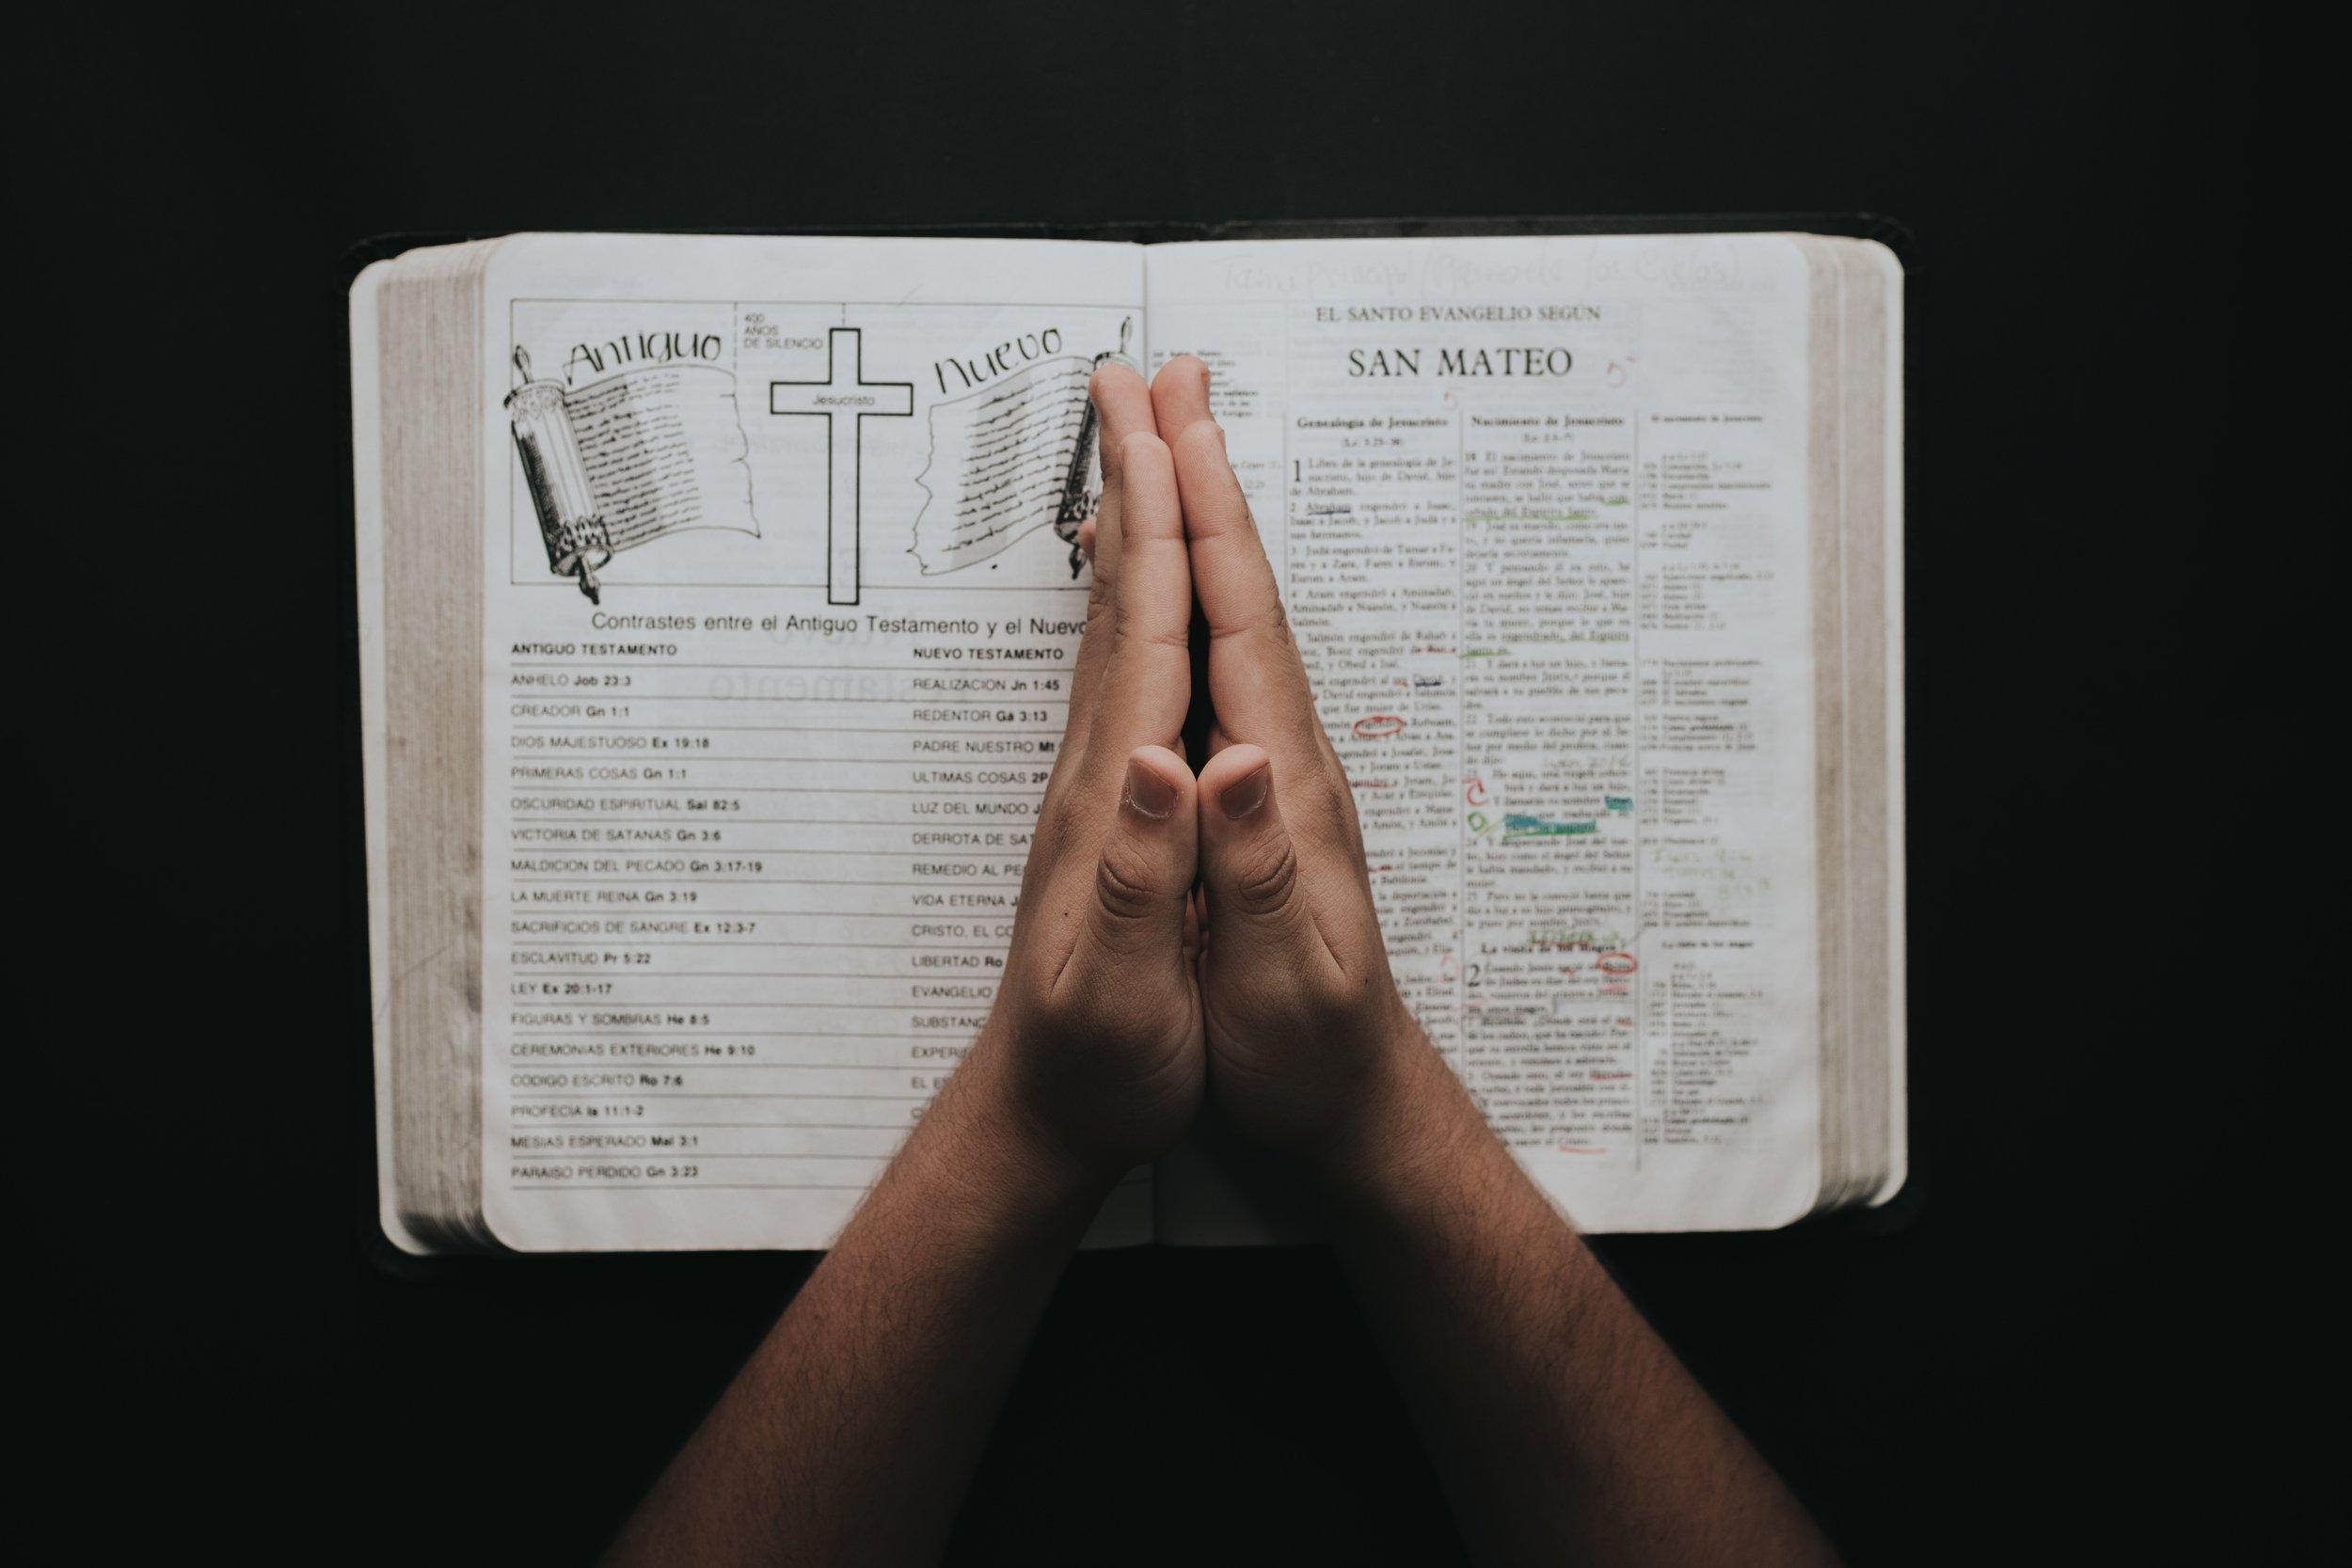 bible-book-faith-2258251.jpg